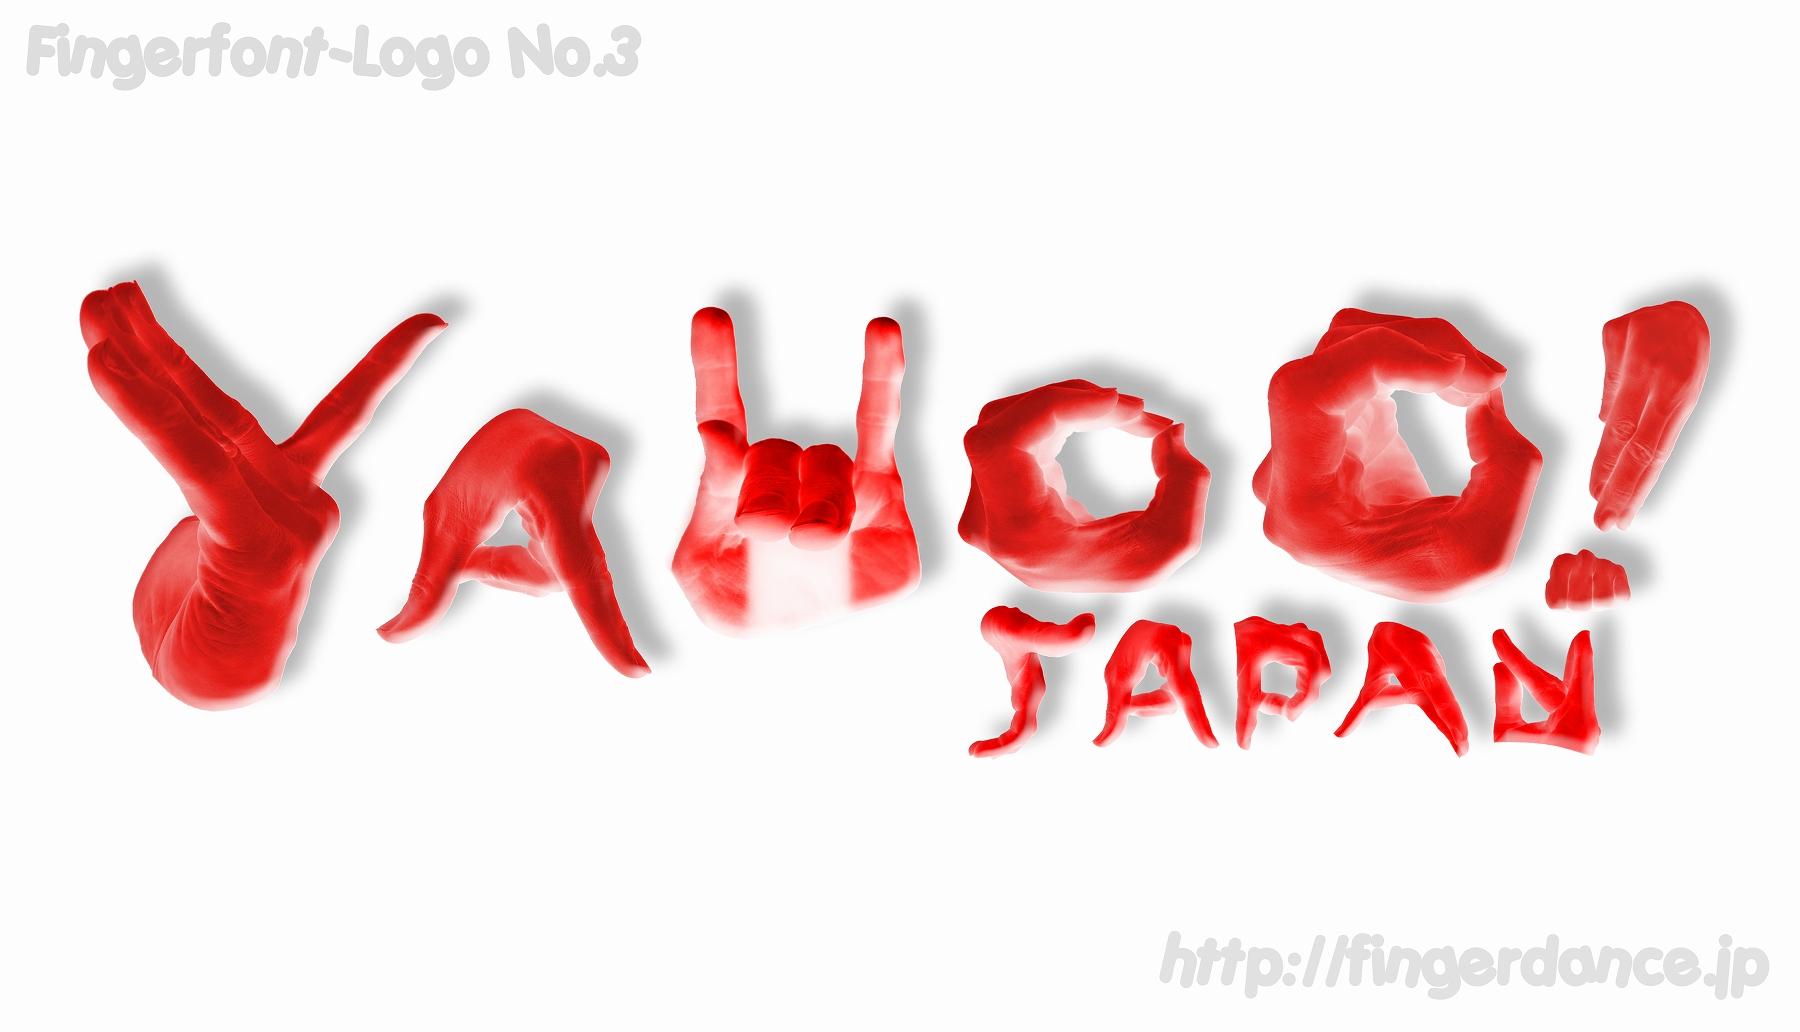 Yahoo-fingerhttp://fingerdance.jp/L/logohand ヤフー・フィンガーロゴハンド手指字